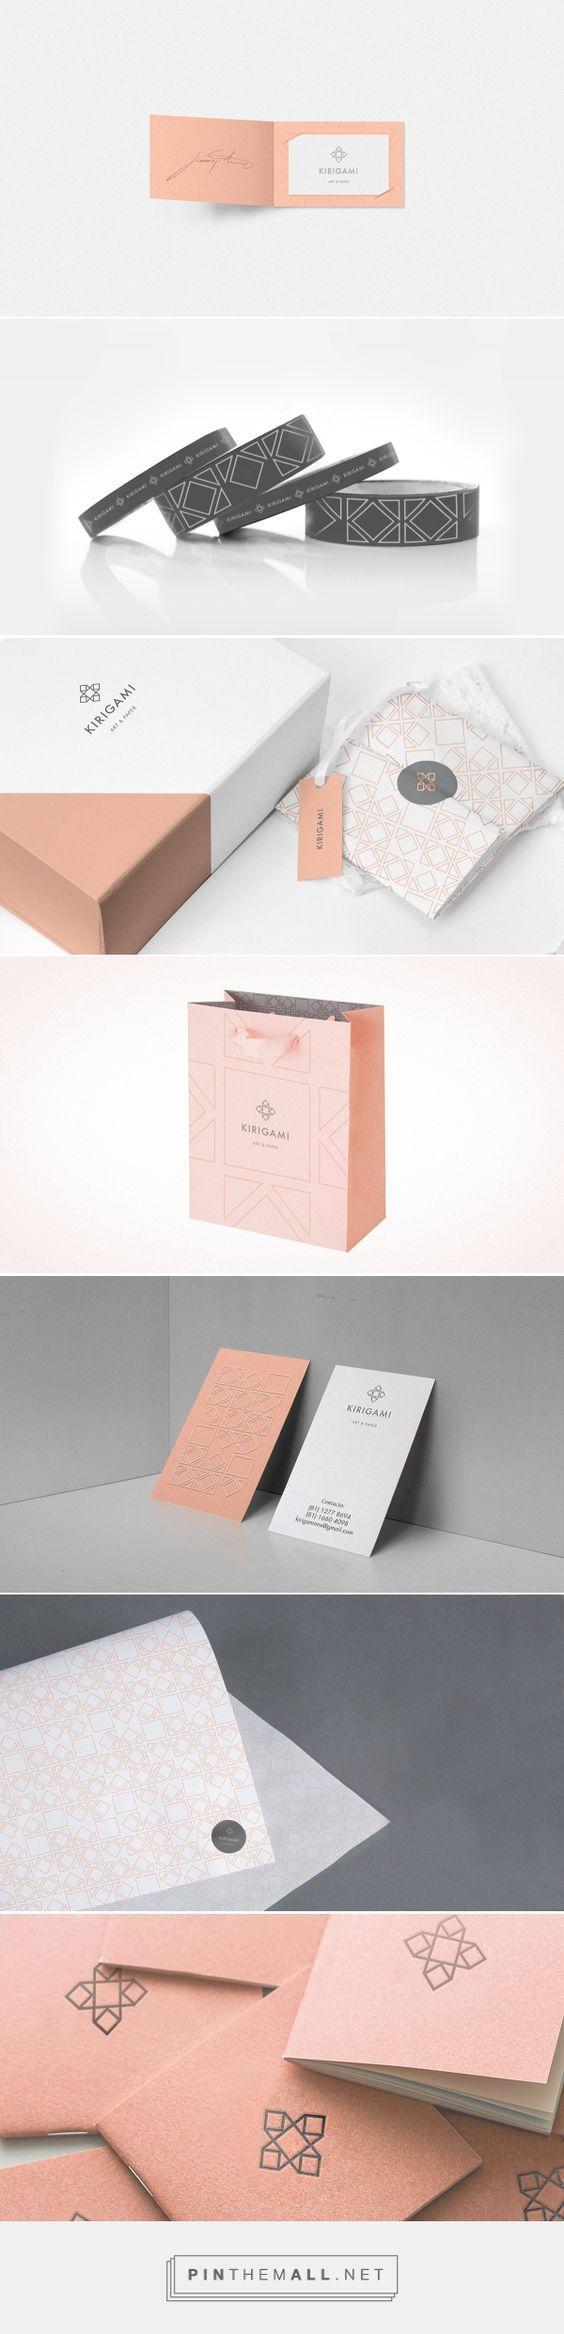 Kirigami Art and Paper Branding by Chapter | Fivestar Branding – Design and Branding Agency & Inspiration Gallery